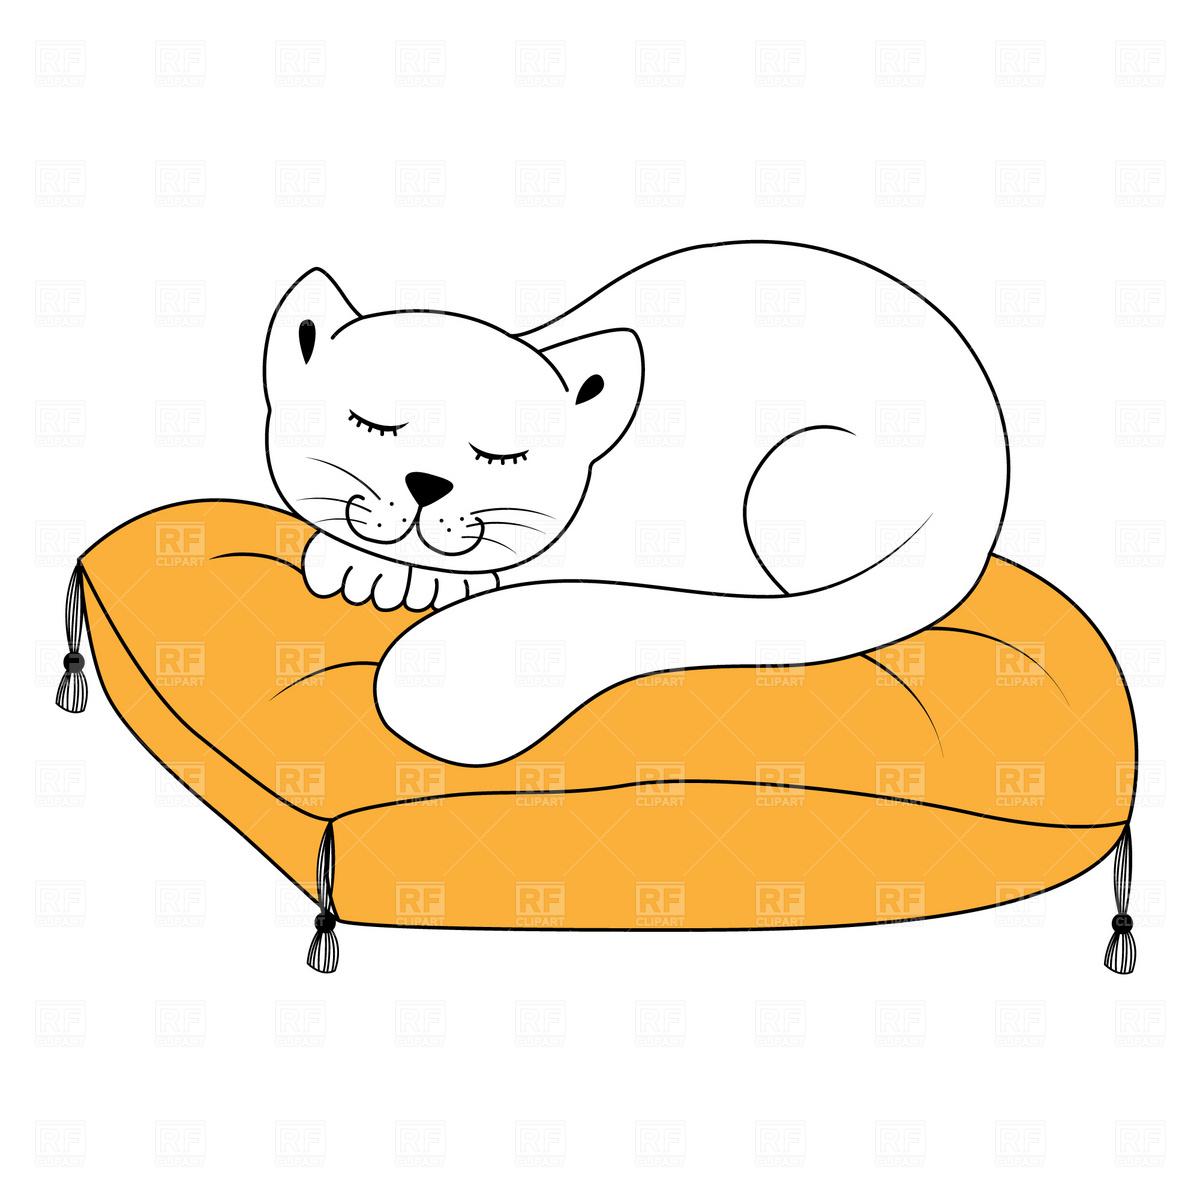 Cat sleeping on pillow Vector Image #1799.